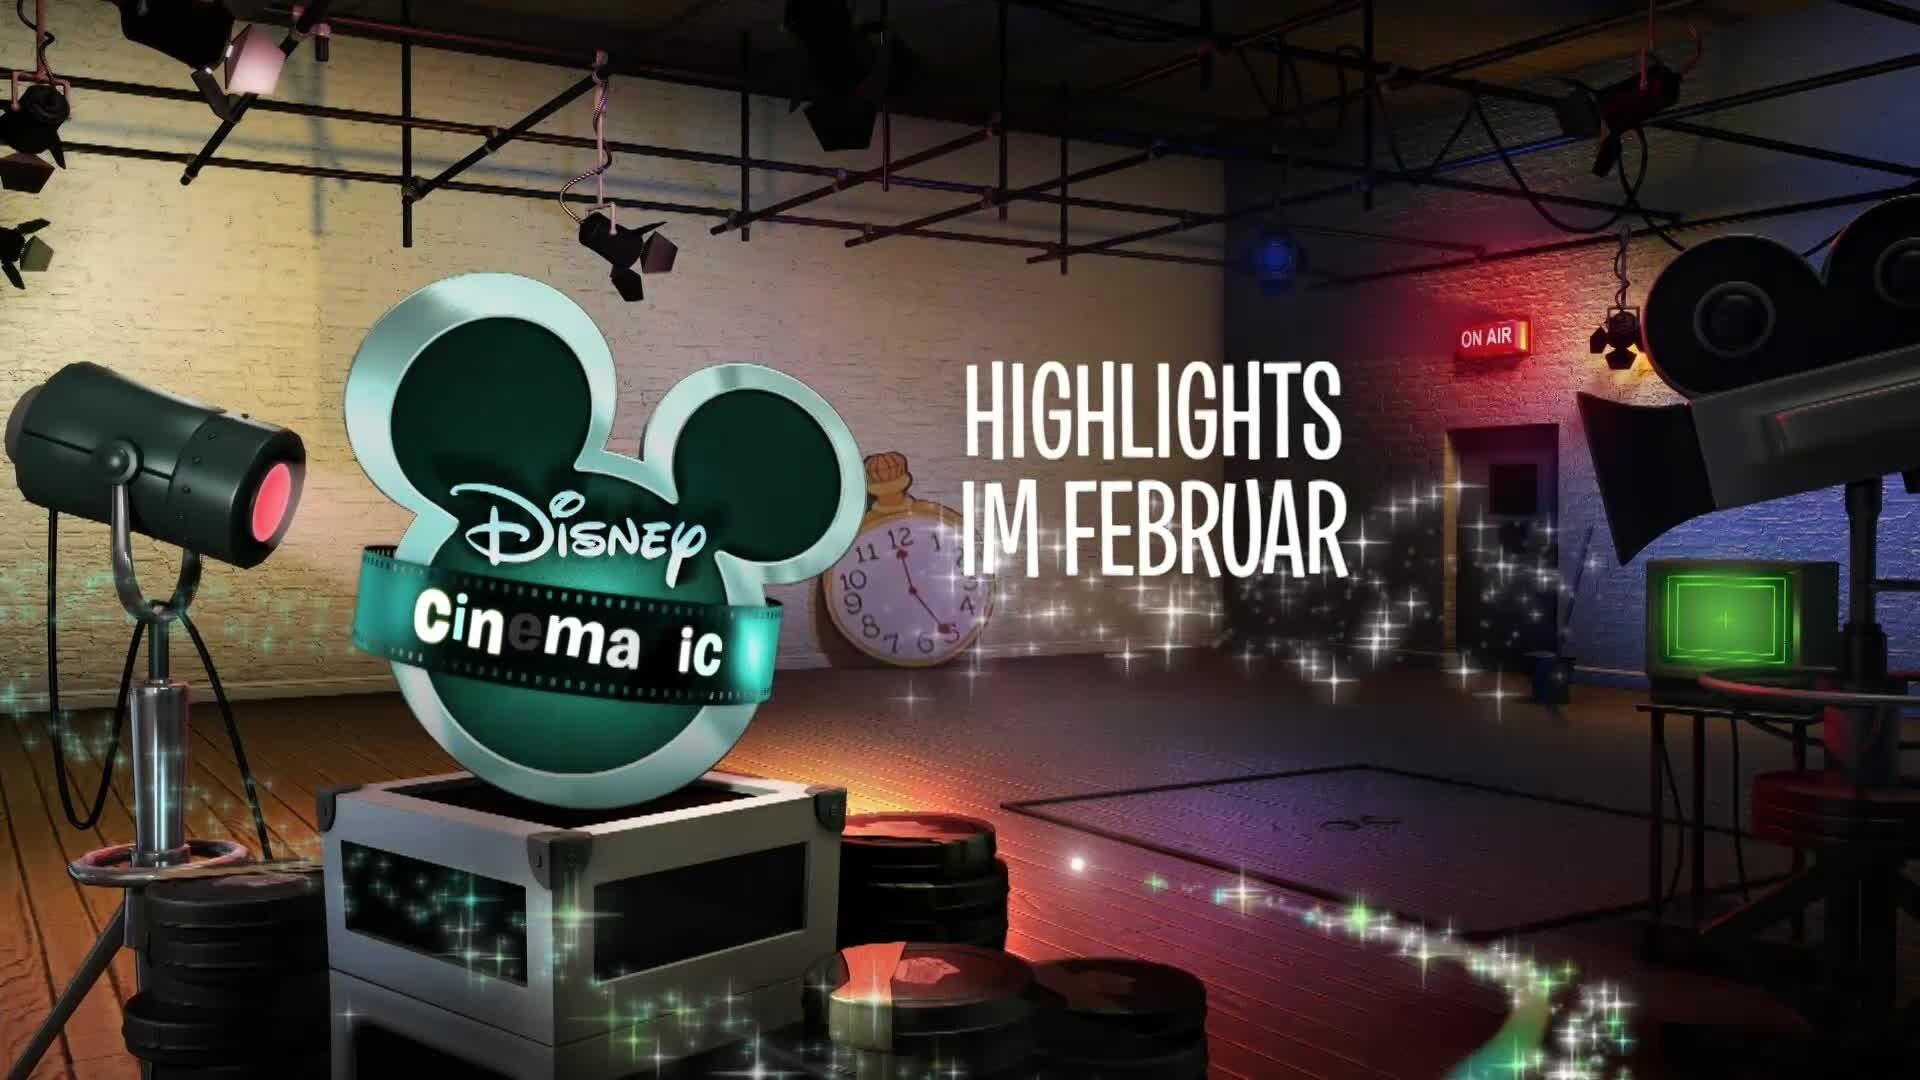 Die Highlights im Februar 2017